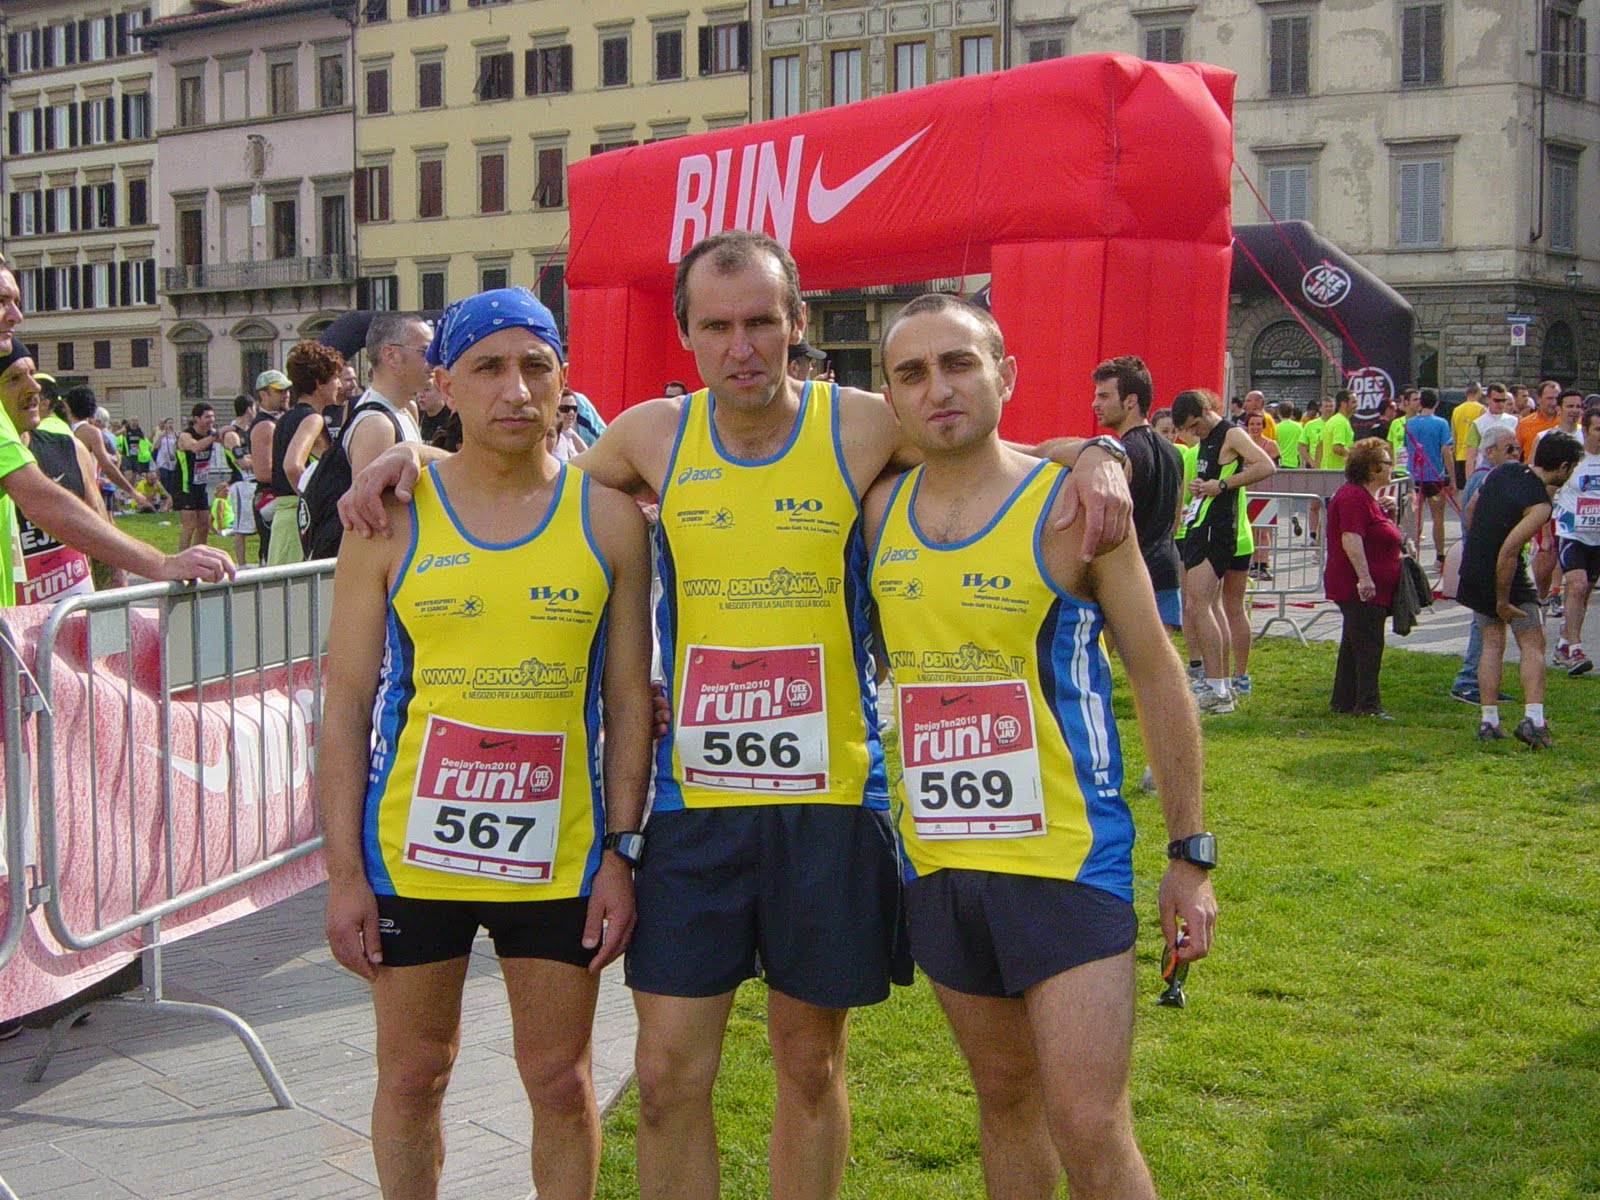 carignano run 01 05 10 01 06 10